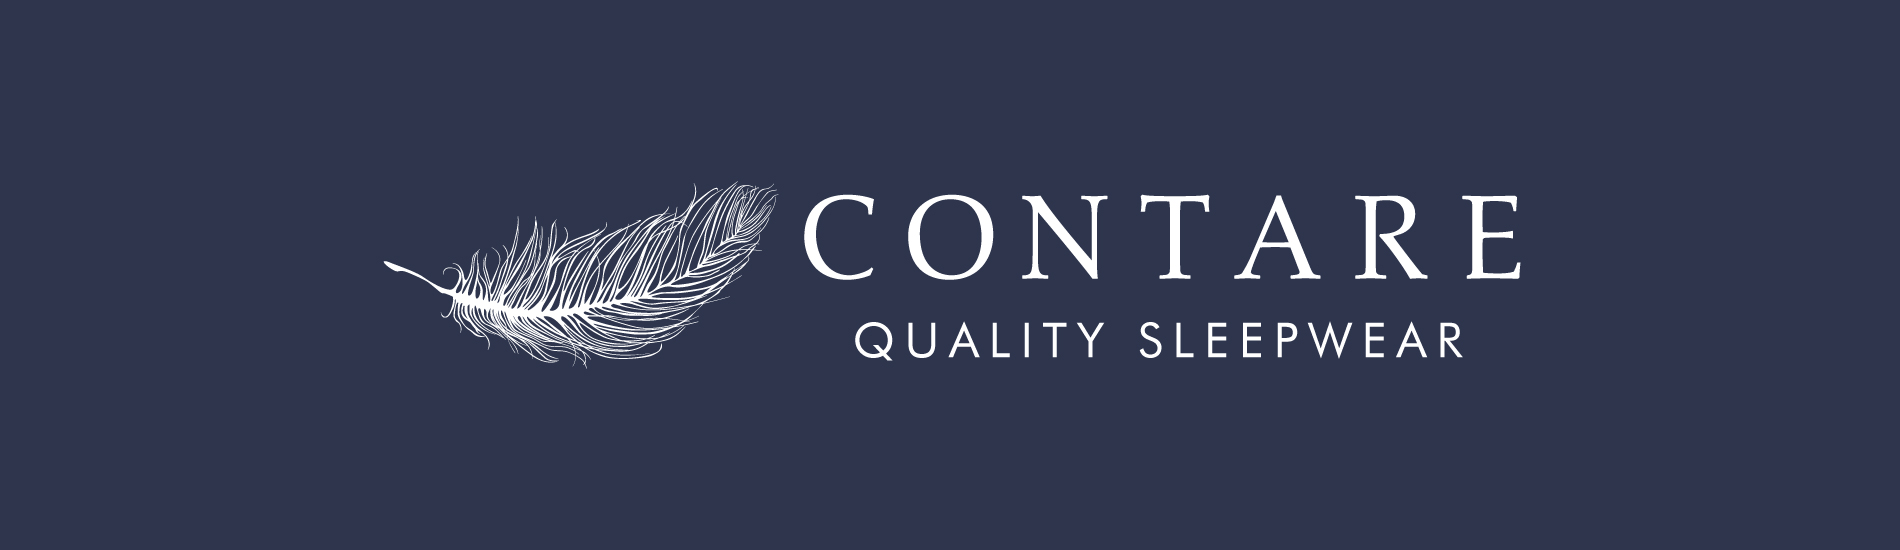 Contare-Logo-Slider-1900px-x-550px